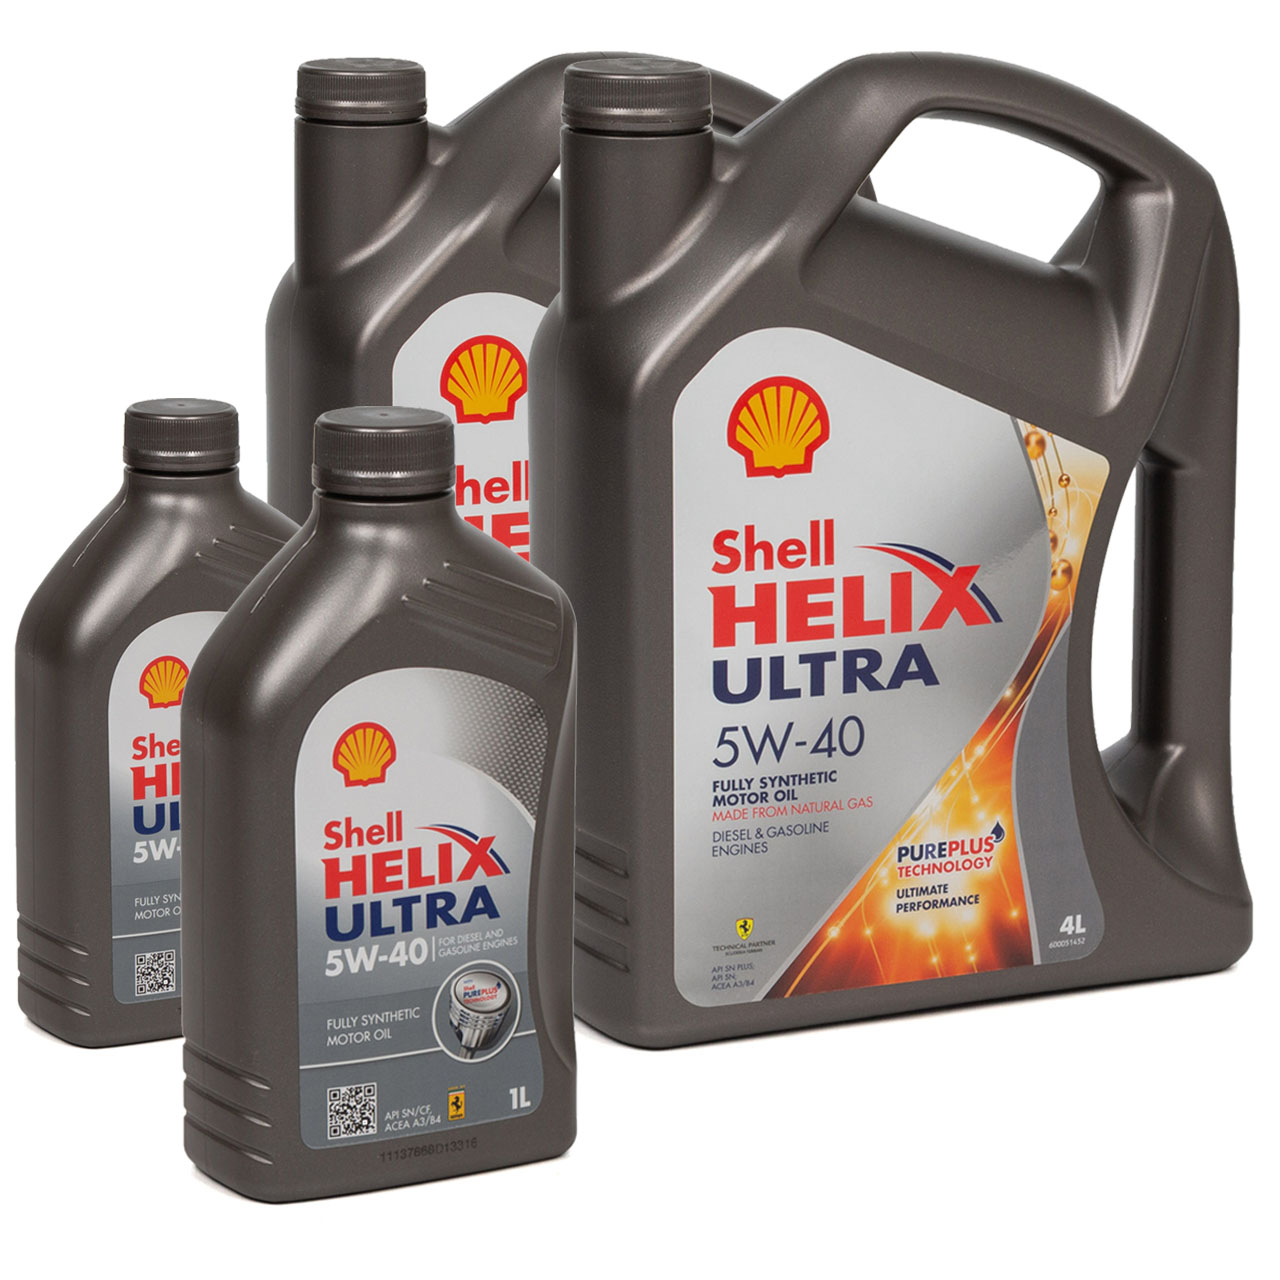 SHELL Motoröl Öl HELIX ULTRA 5W-40 5W40 MB 226/229.5 VW 502/505.00 - 10 Liter